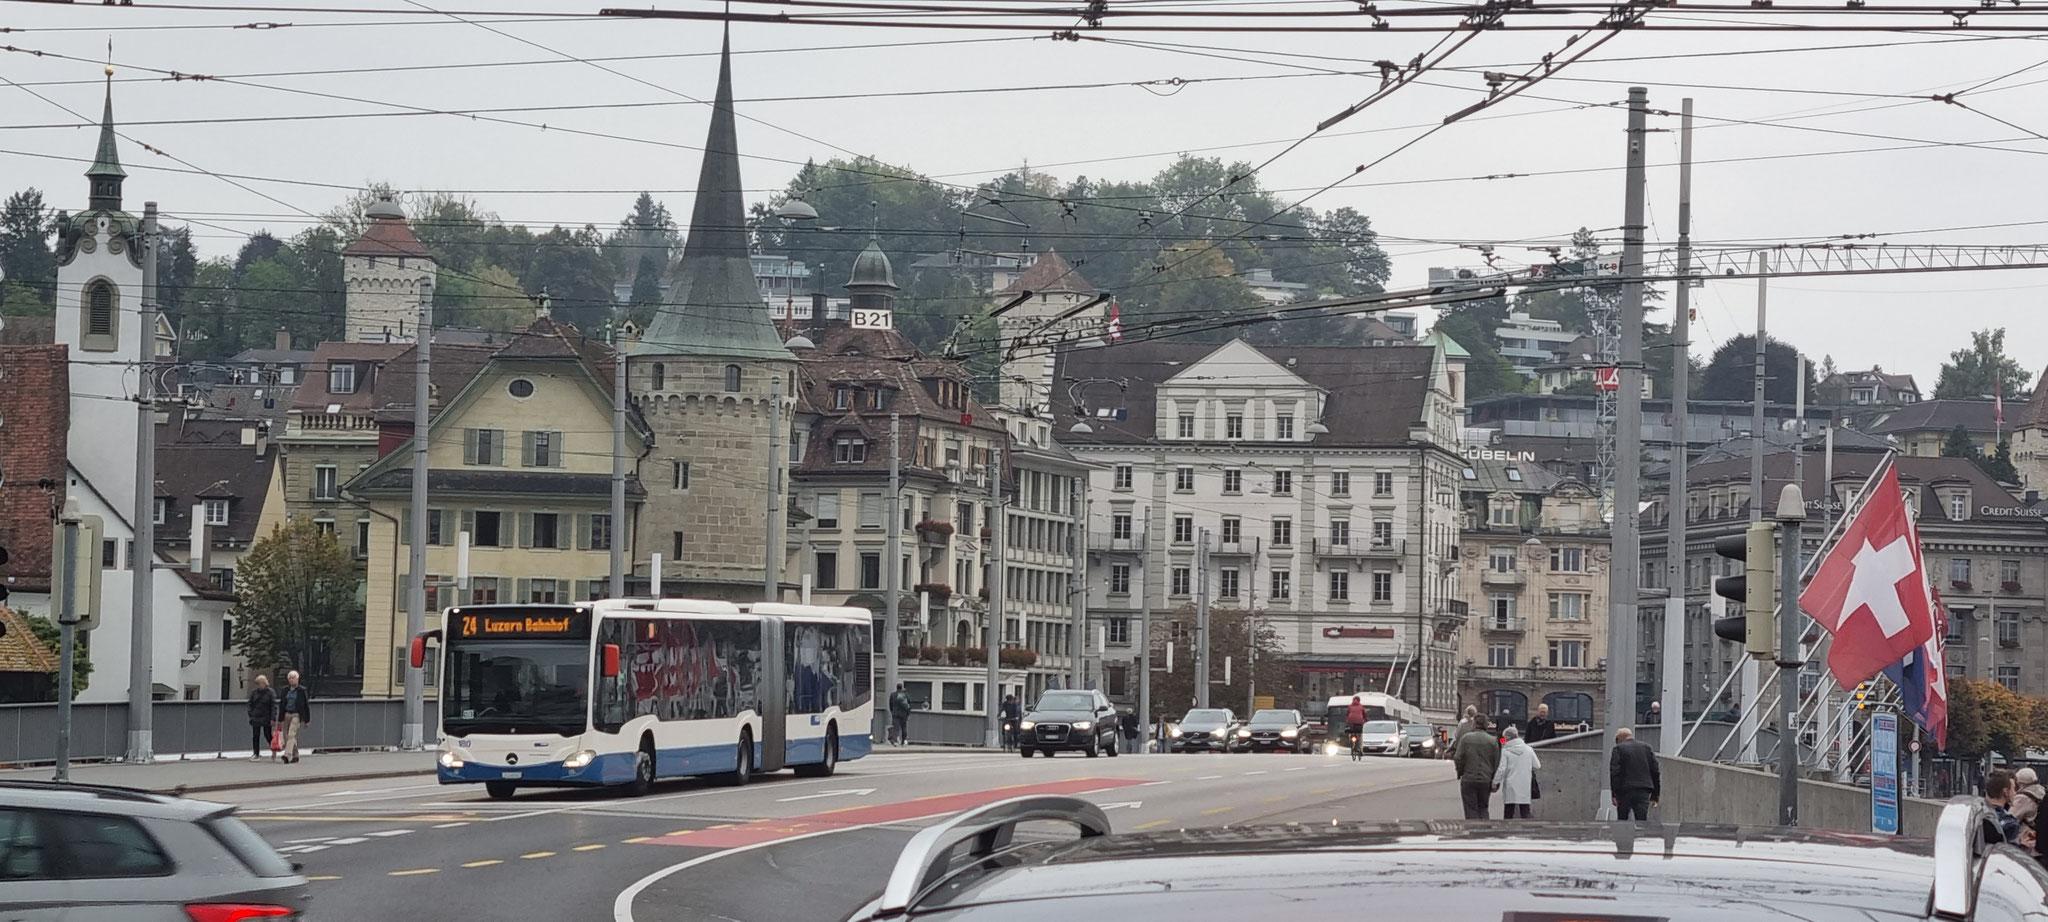 ...Luzern